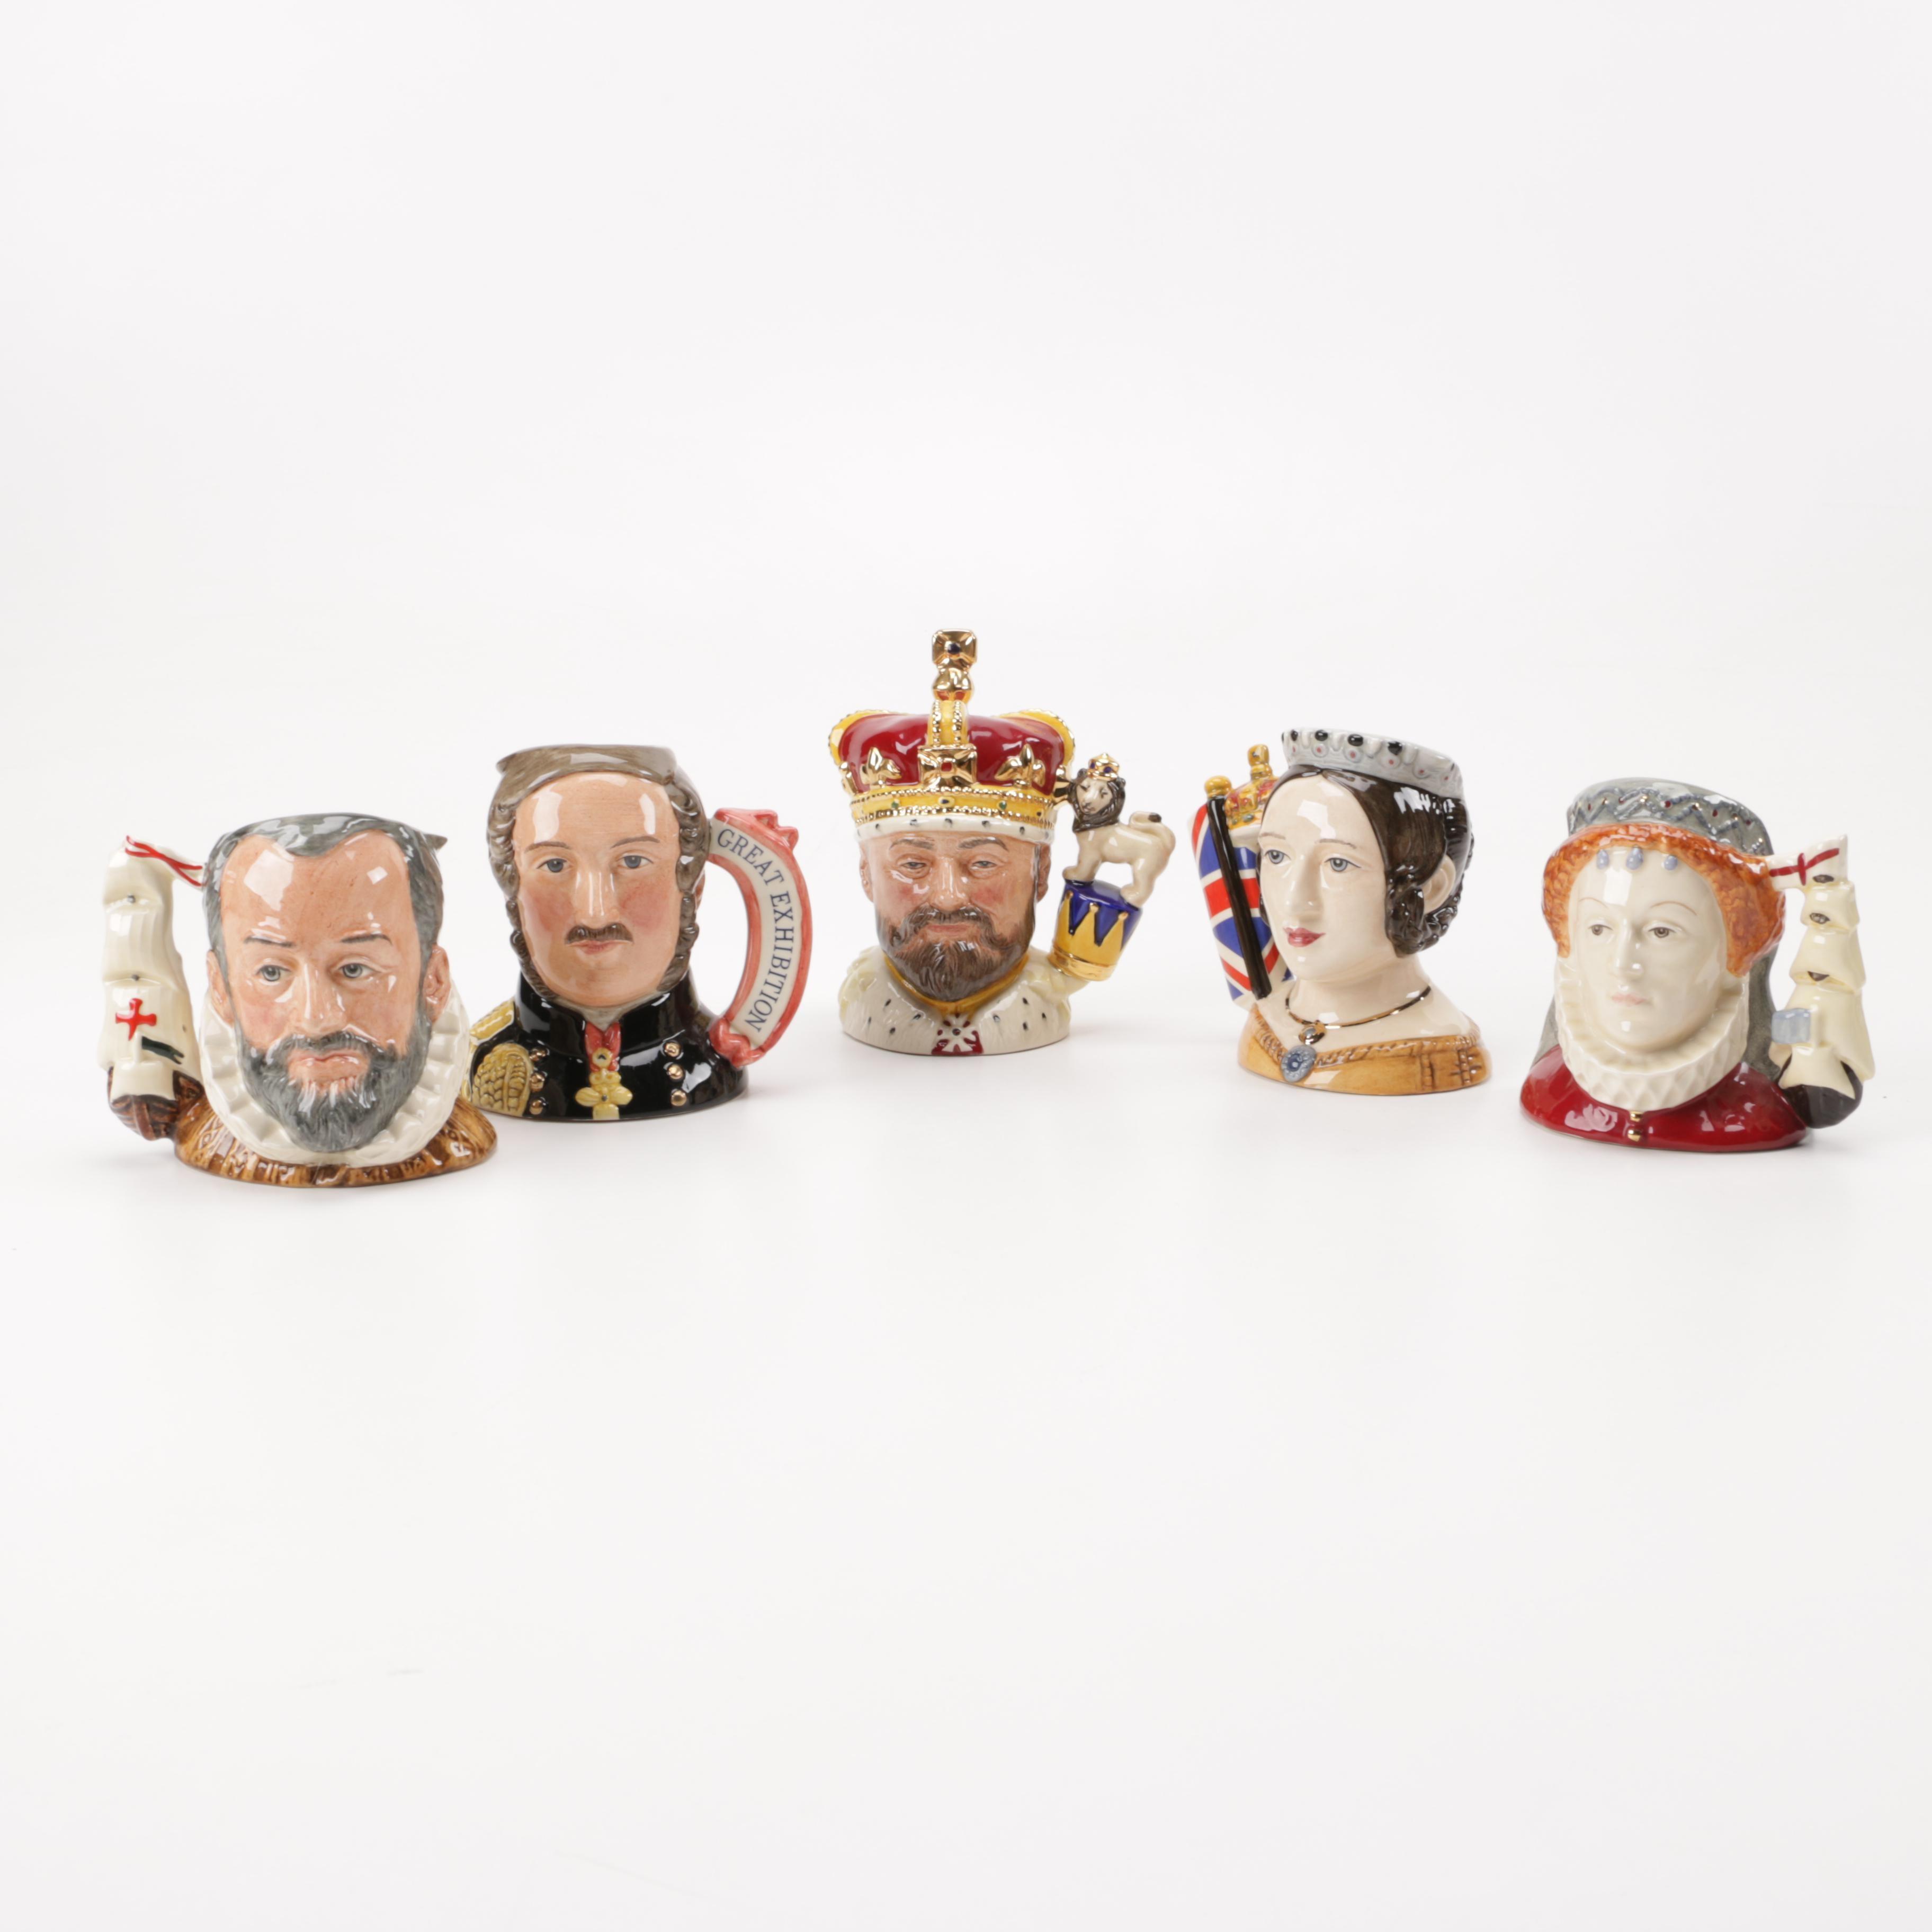 Royal Doulton Royality Toby Jugs